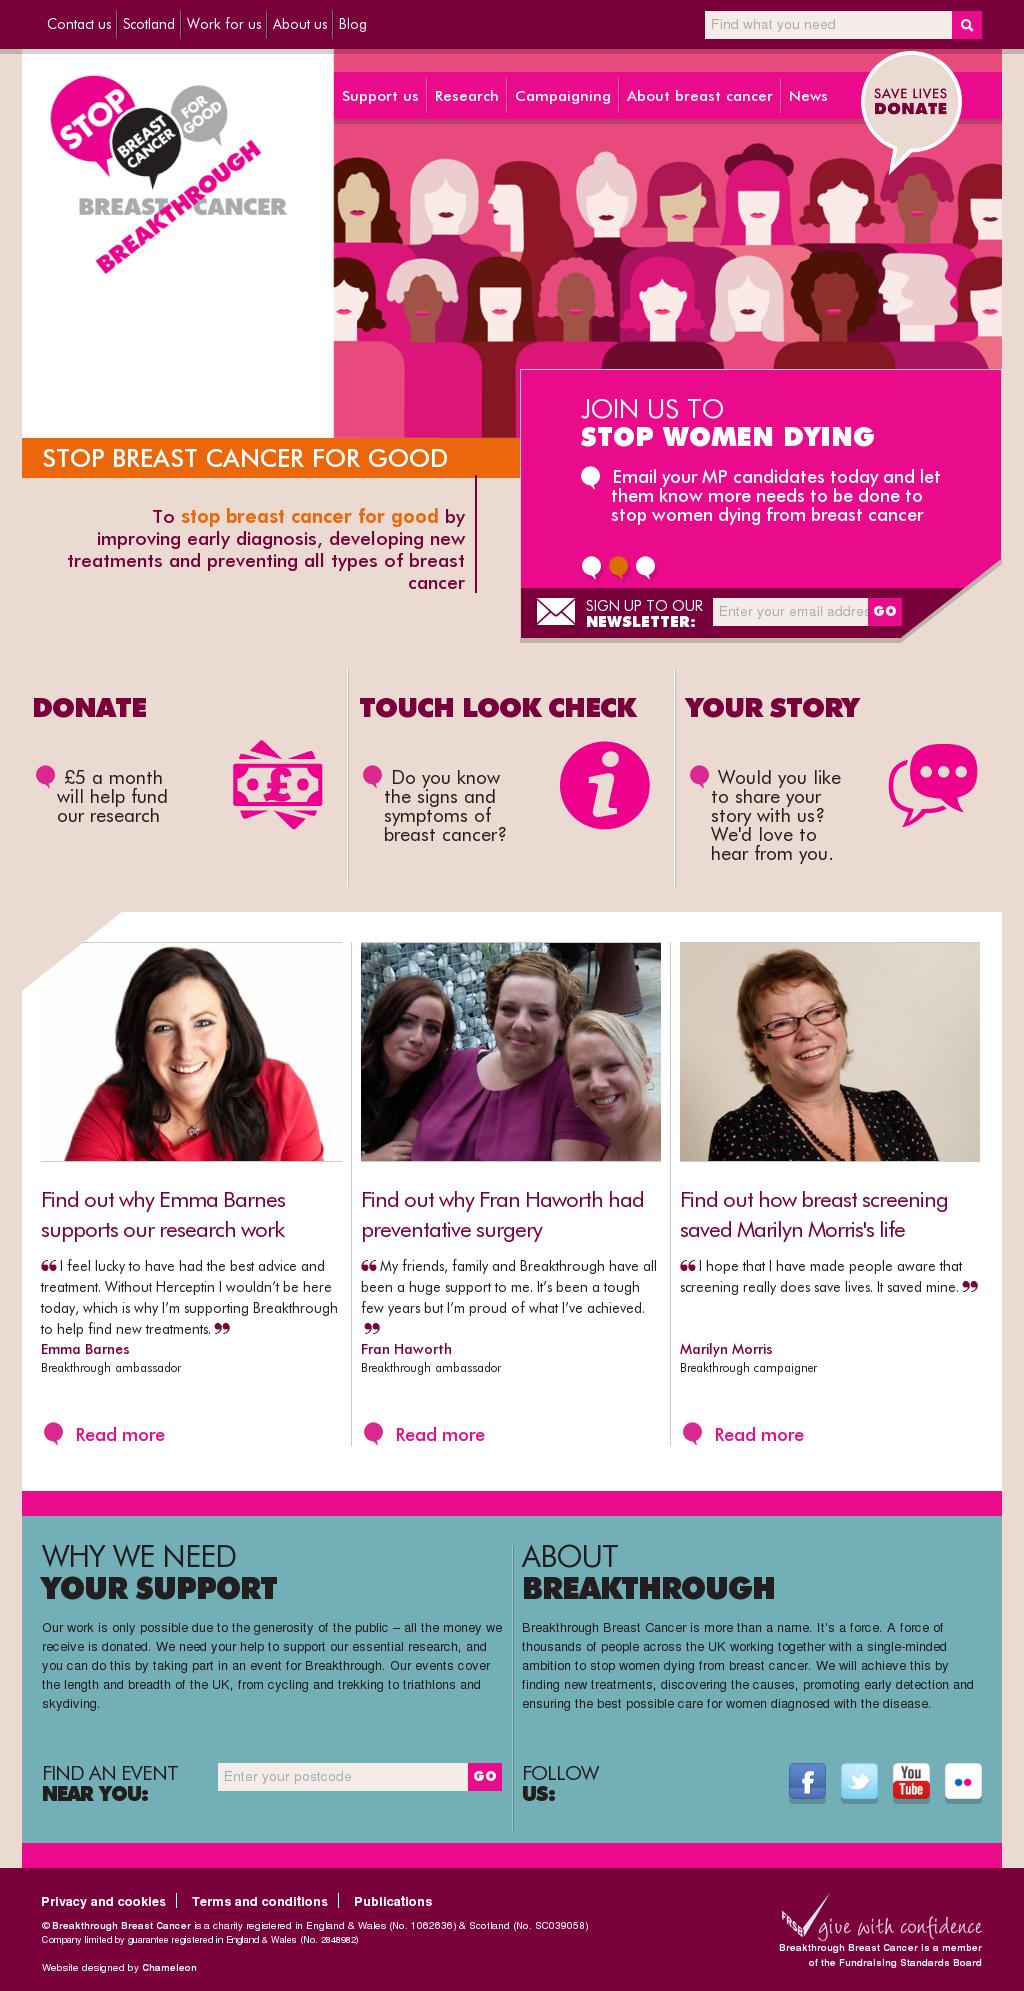 Breakthrough breast cancer scotland